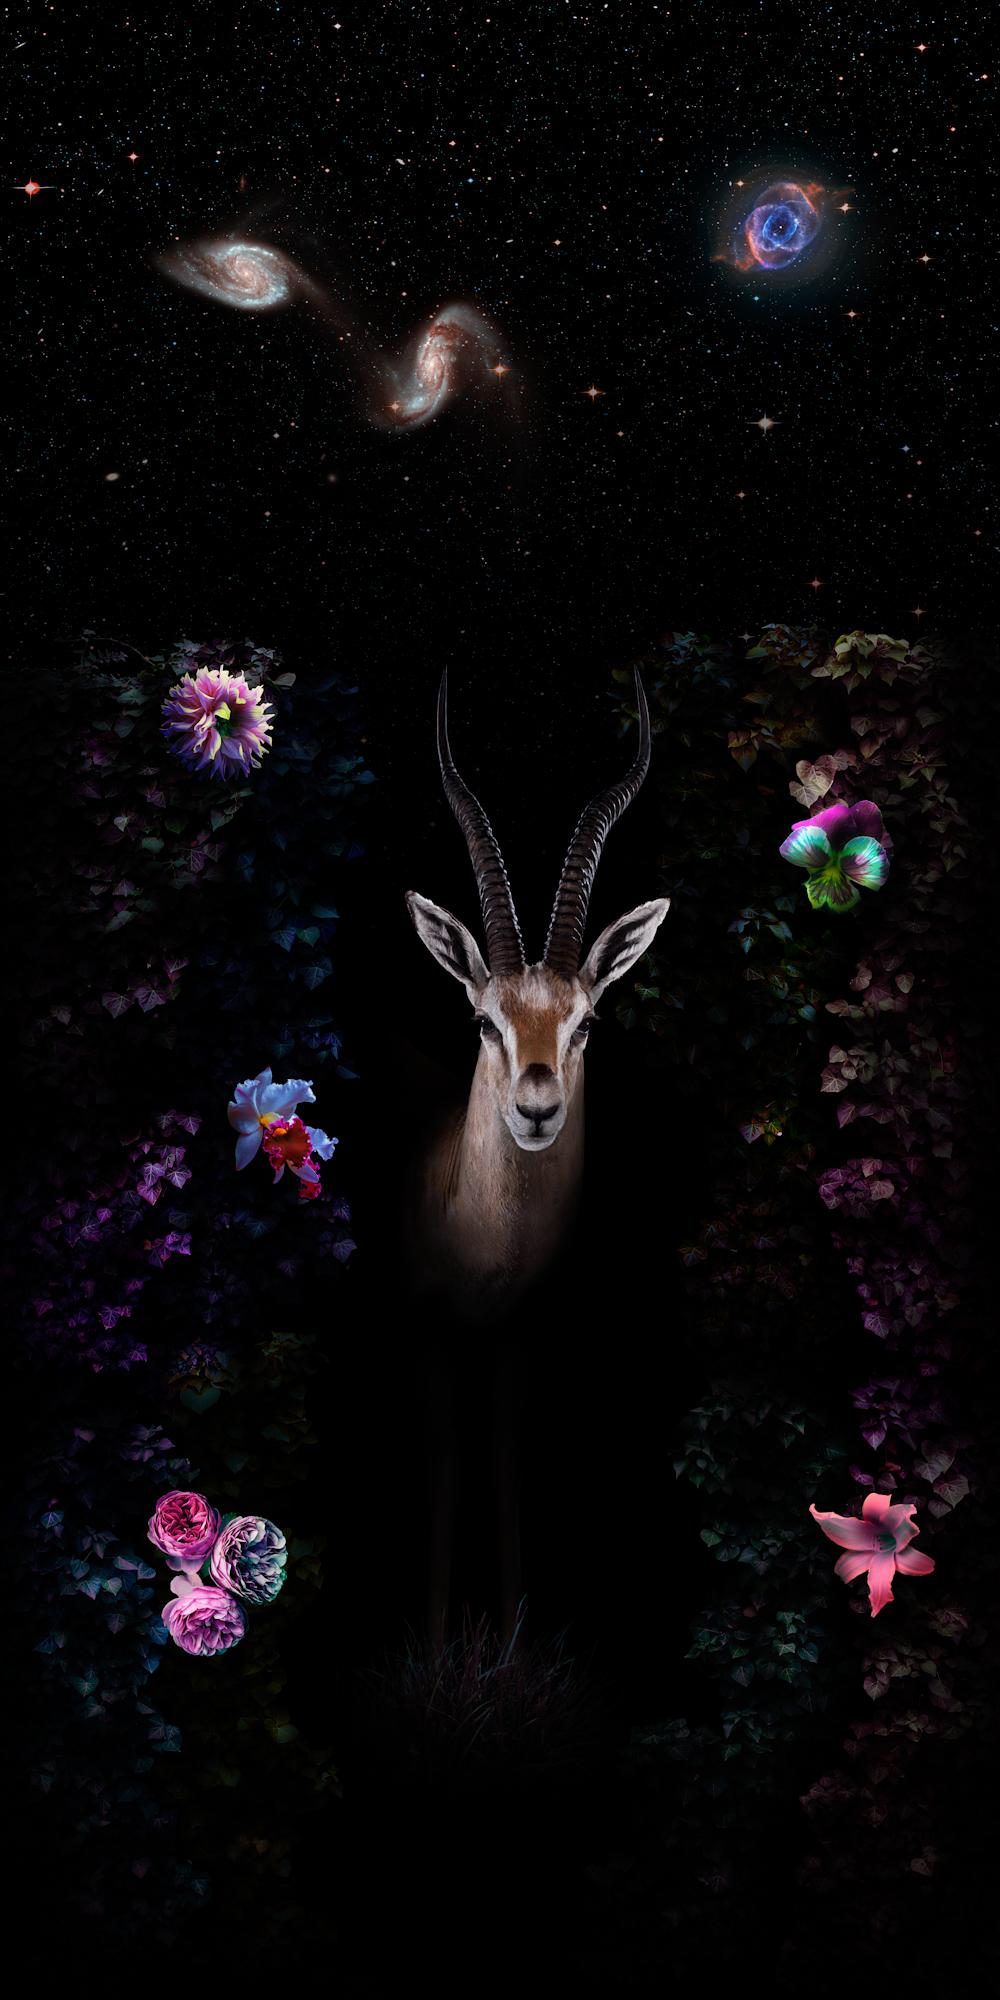 gazelle-ioa.jpg